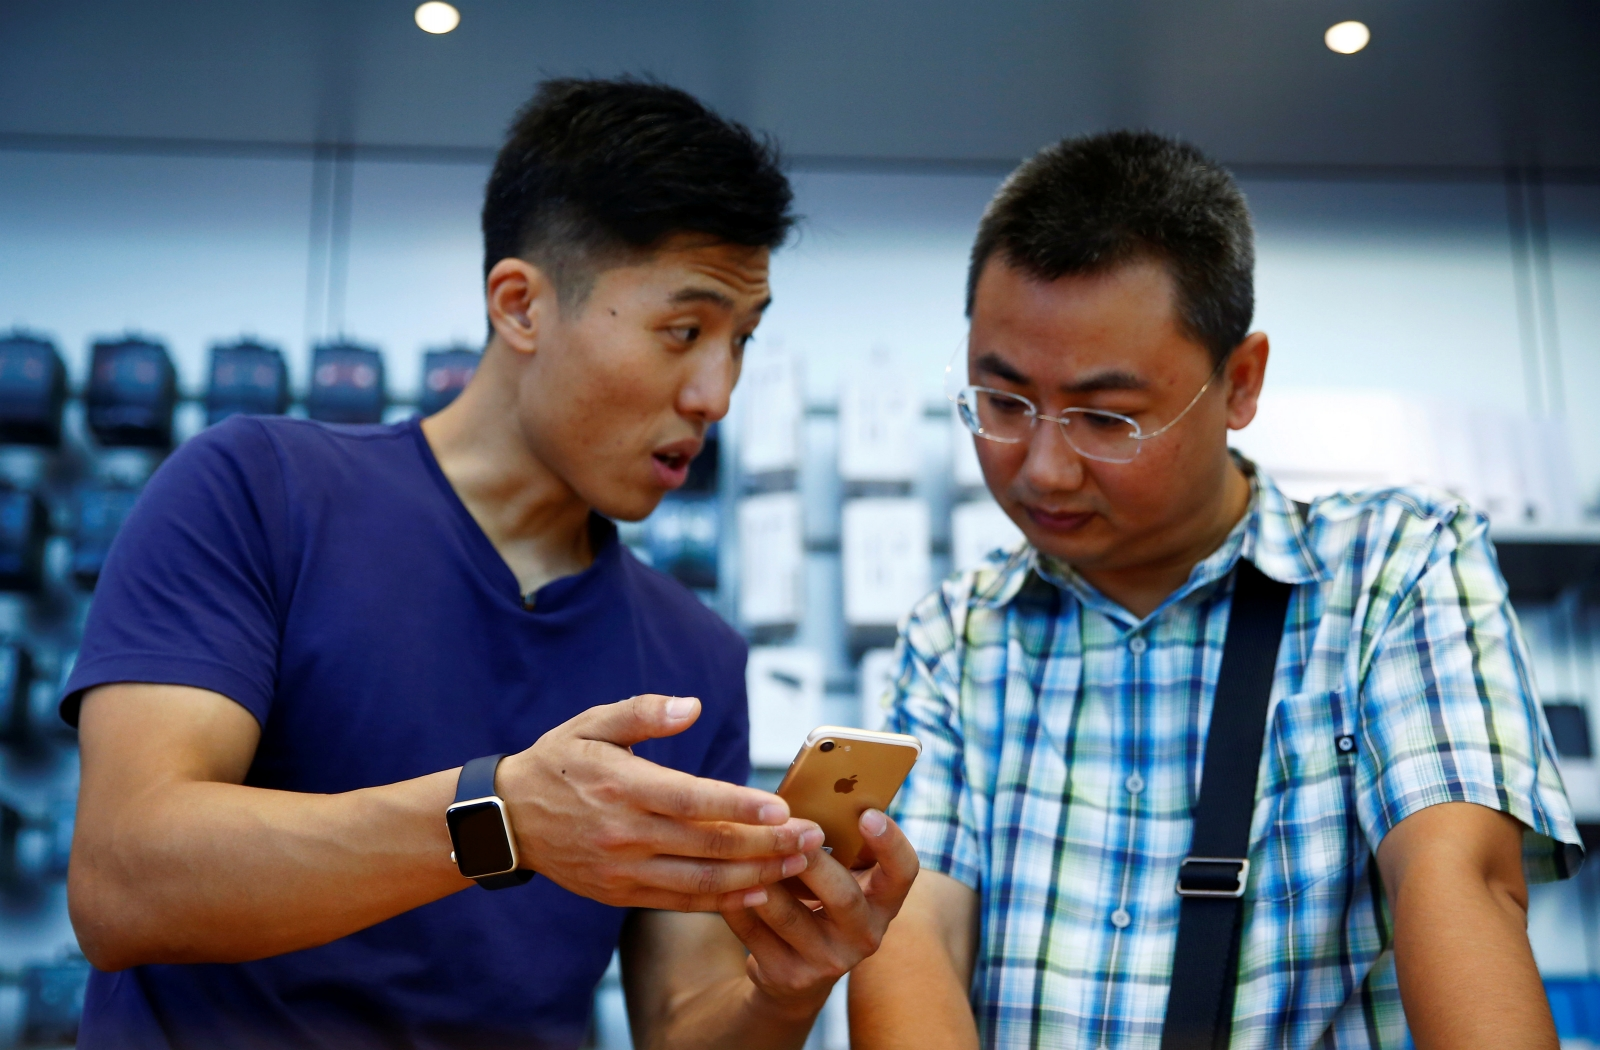 China Apple Store employee explains iPhone 7